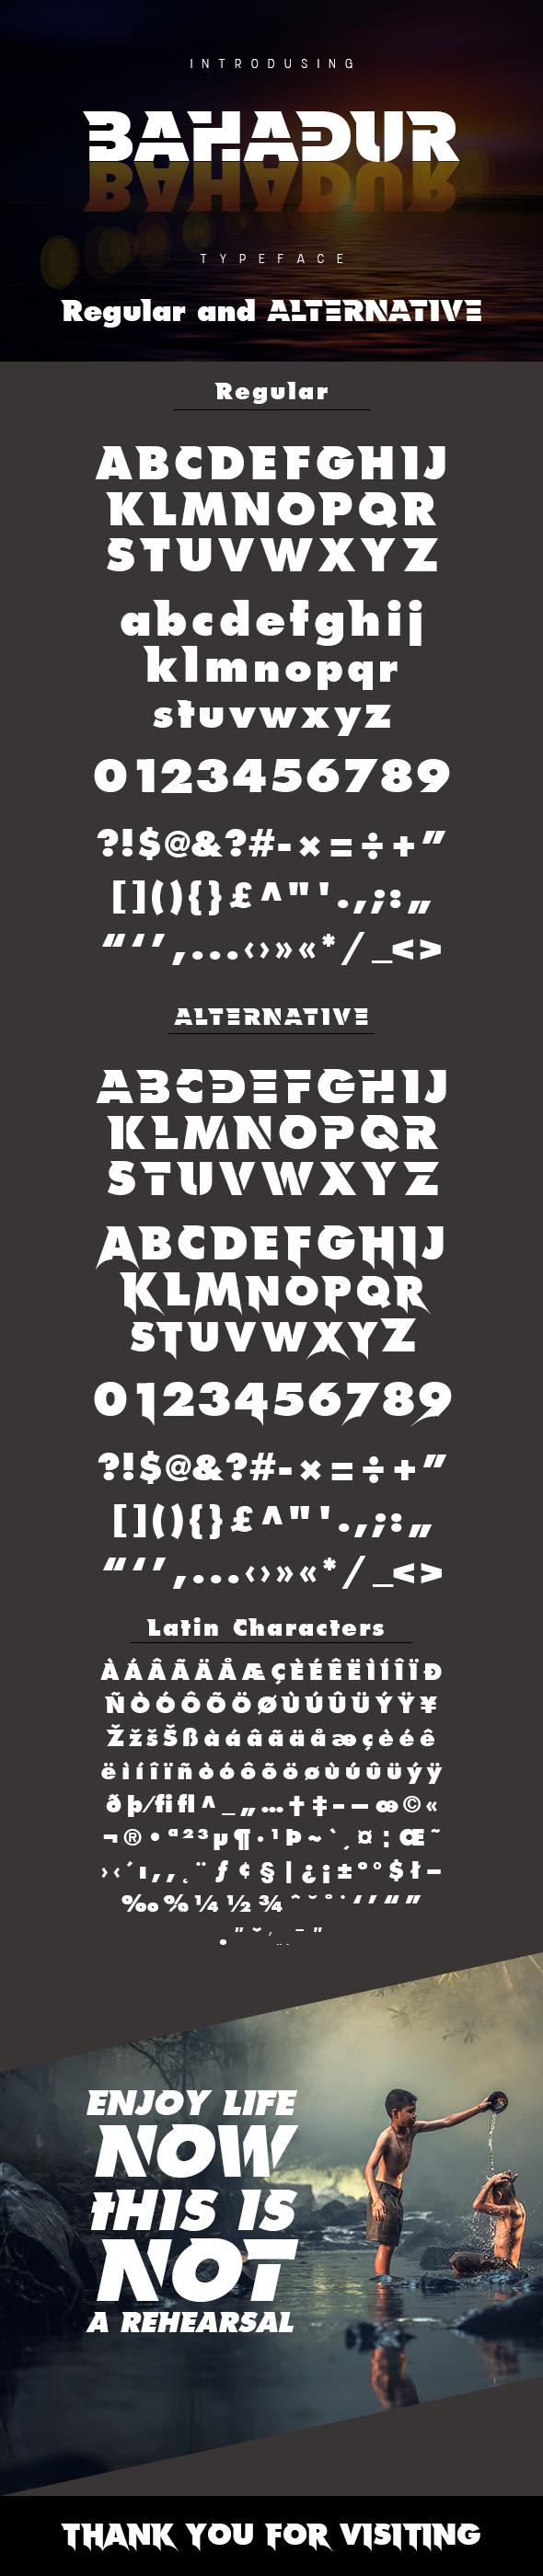 Free Font Bahadur Typeface Download